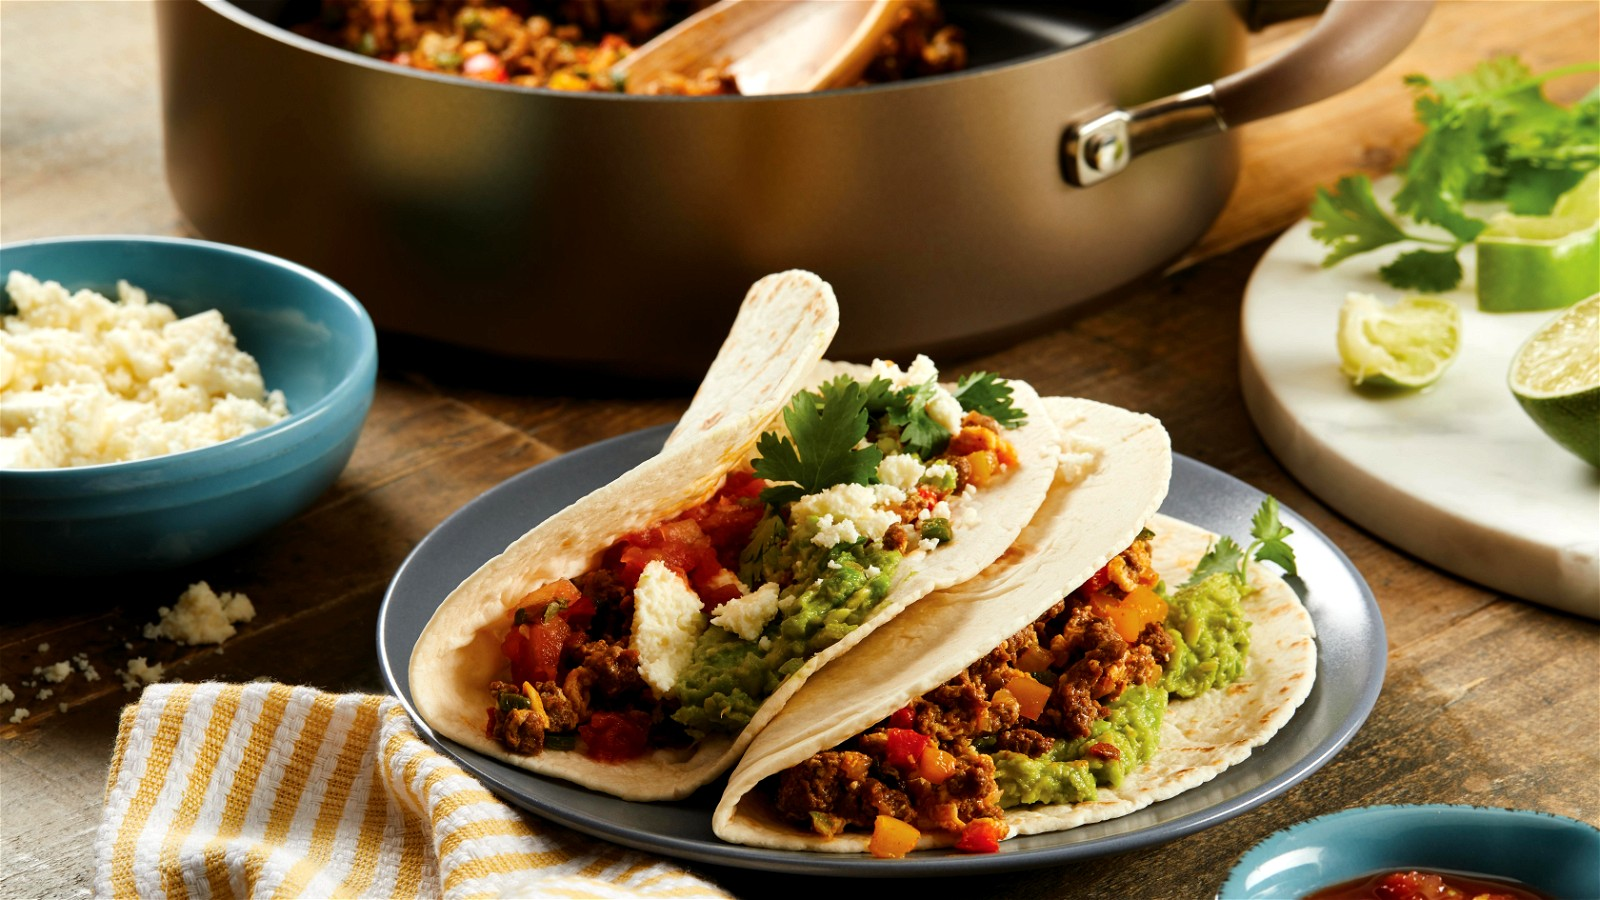 Image of  Spicy Stir-Fried Chorizo and Veggie Breakfast Tacos